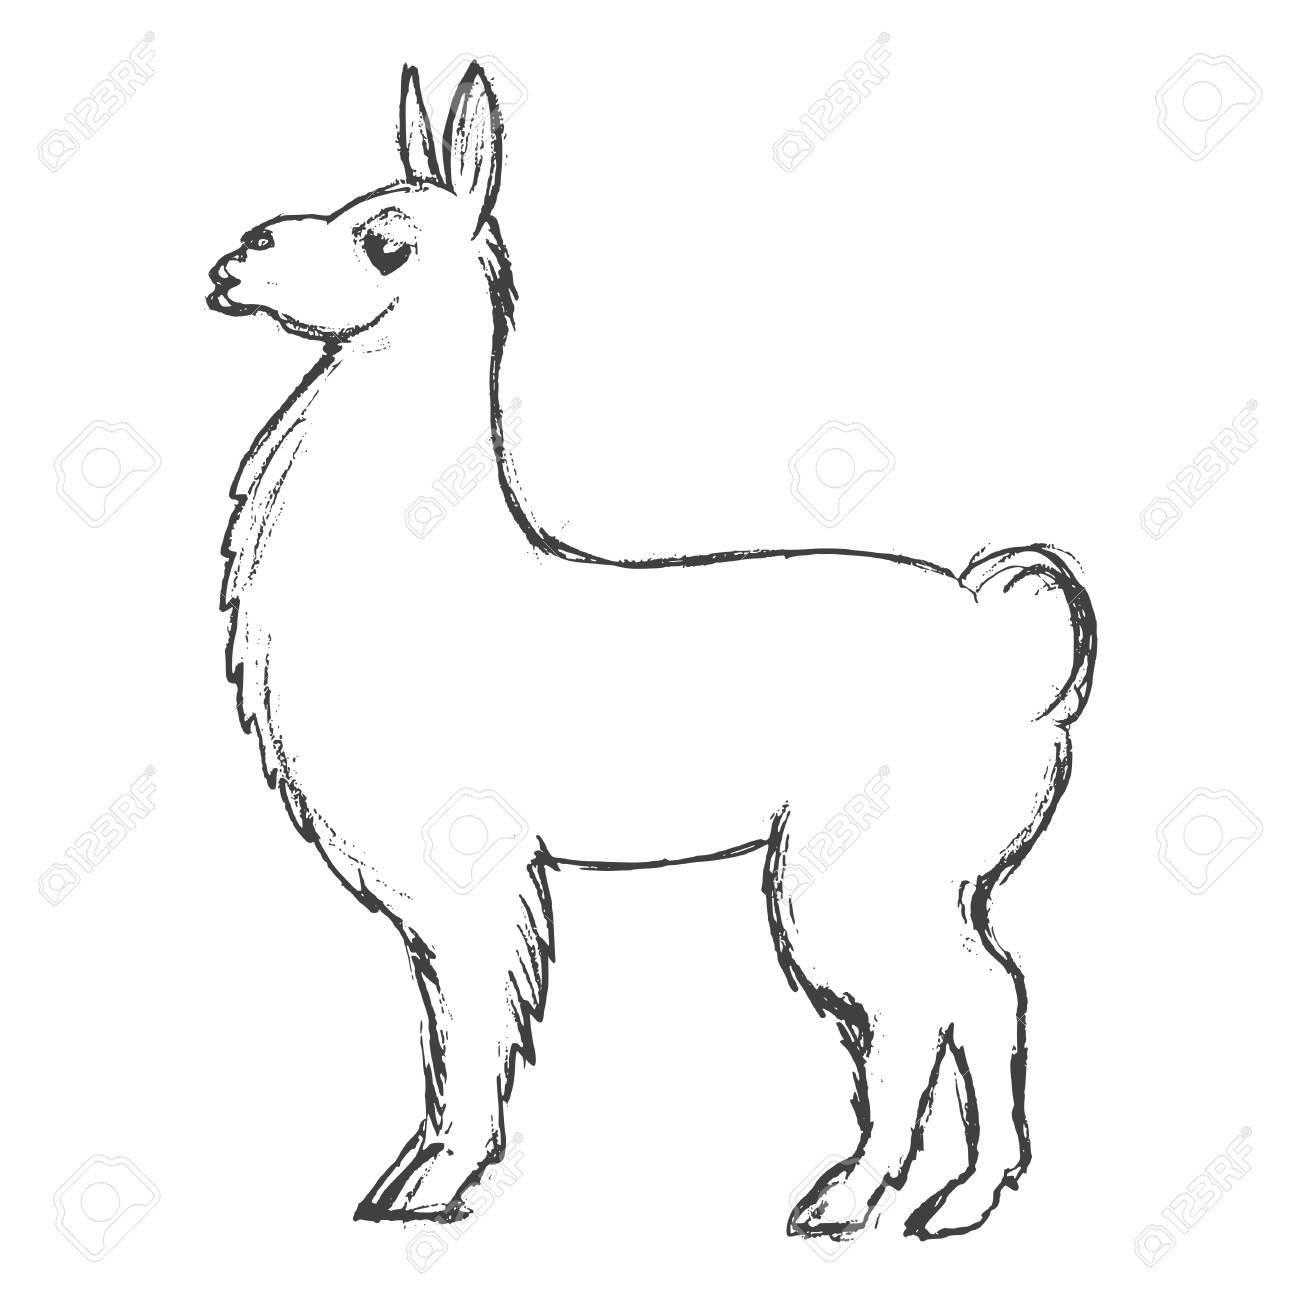 1300x1300 Vector, Sketch, Hand Drawn Illustration Of Lama Royalty Free